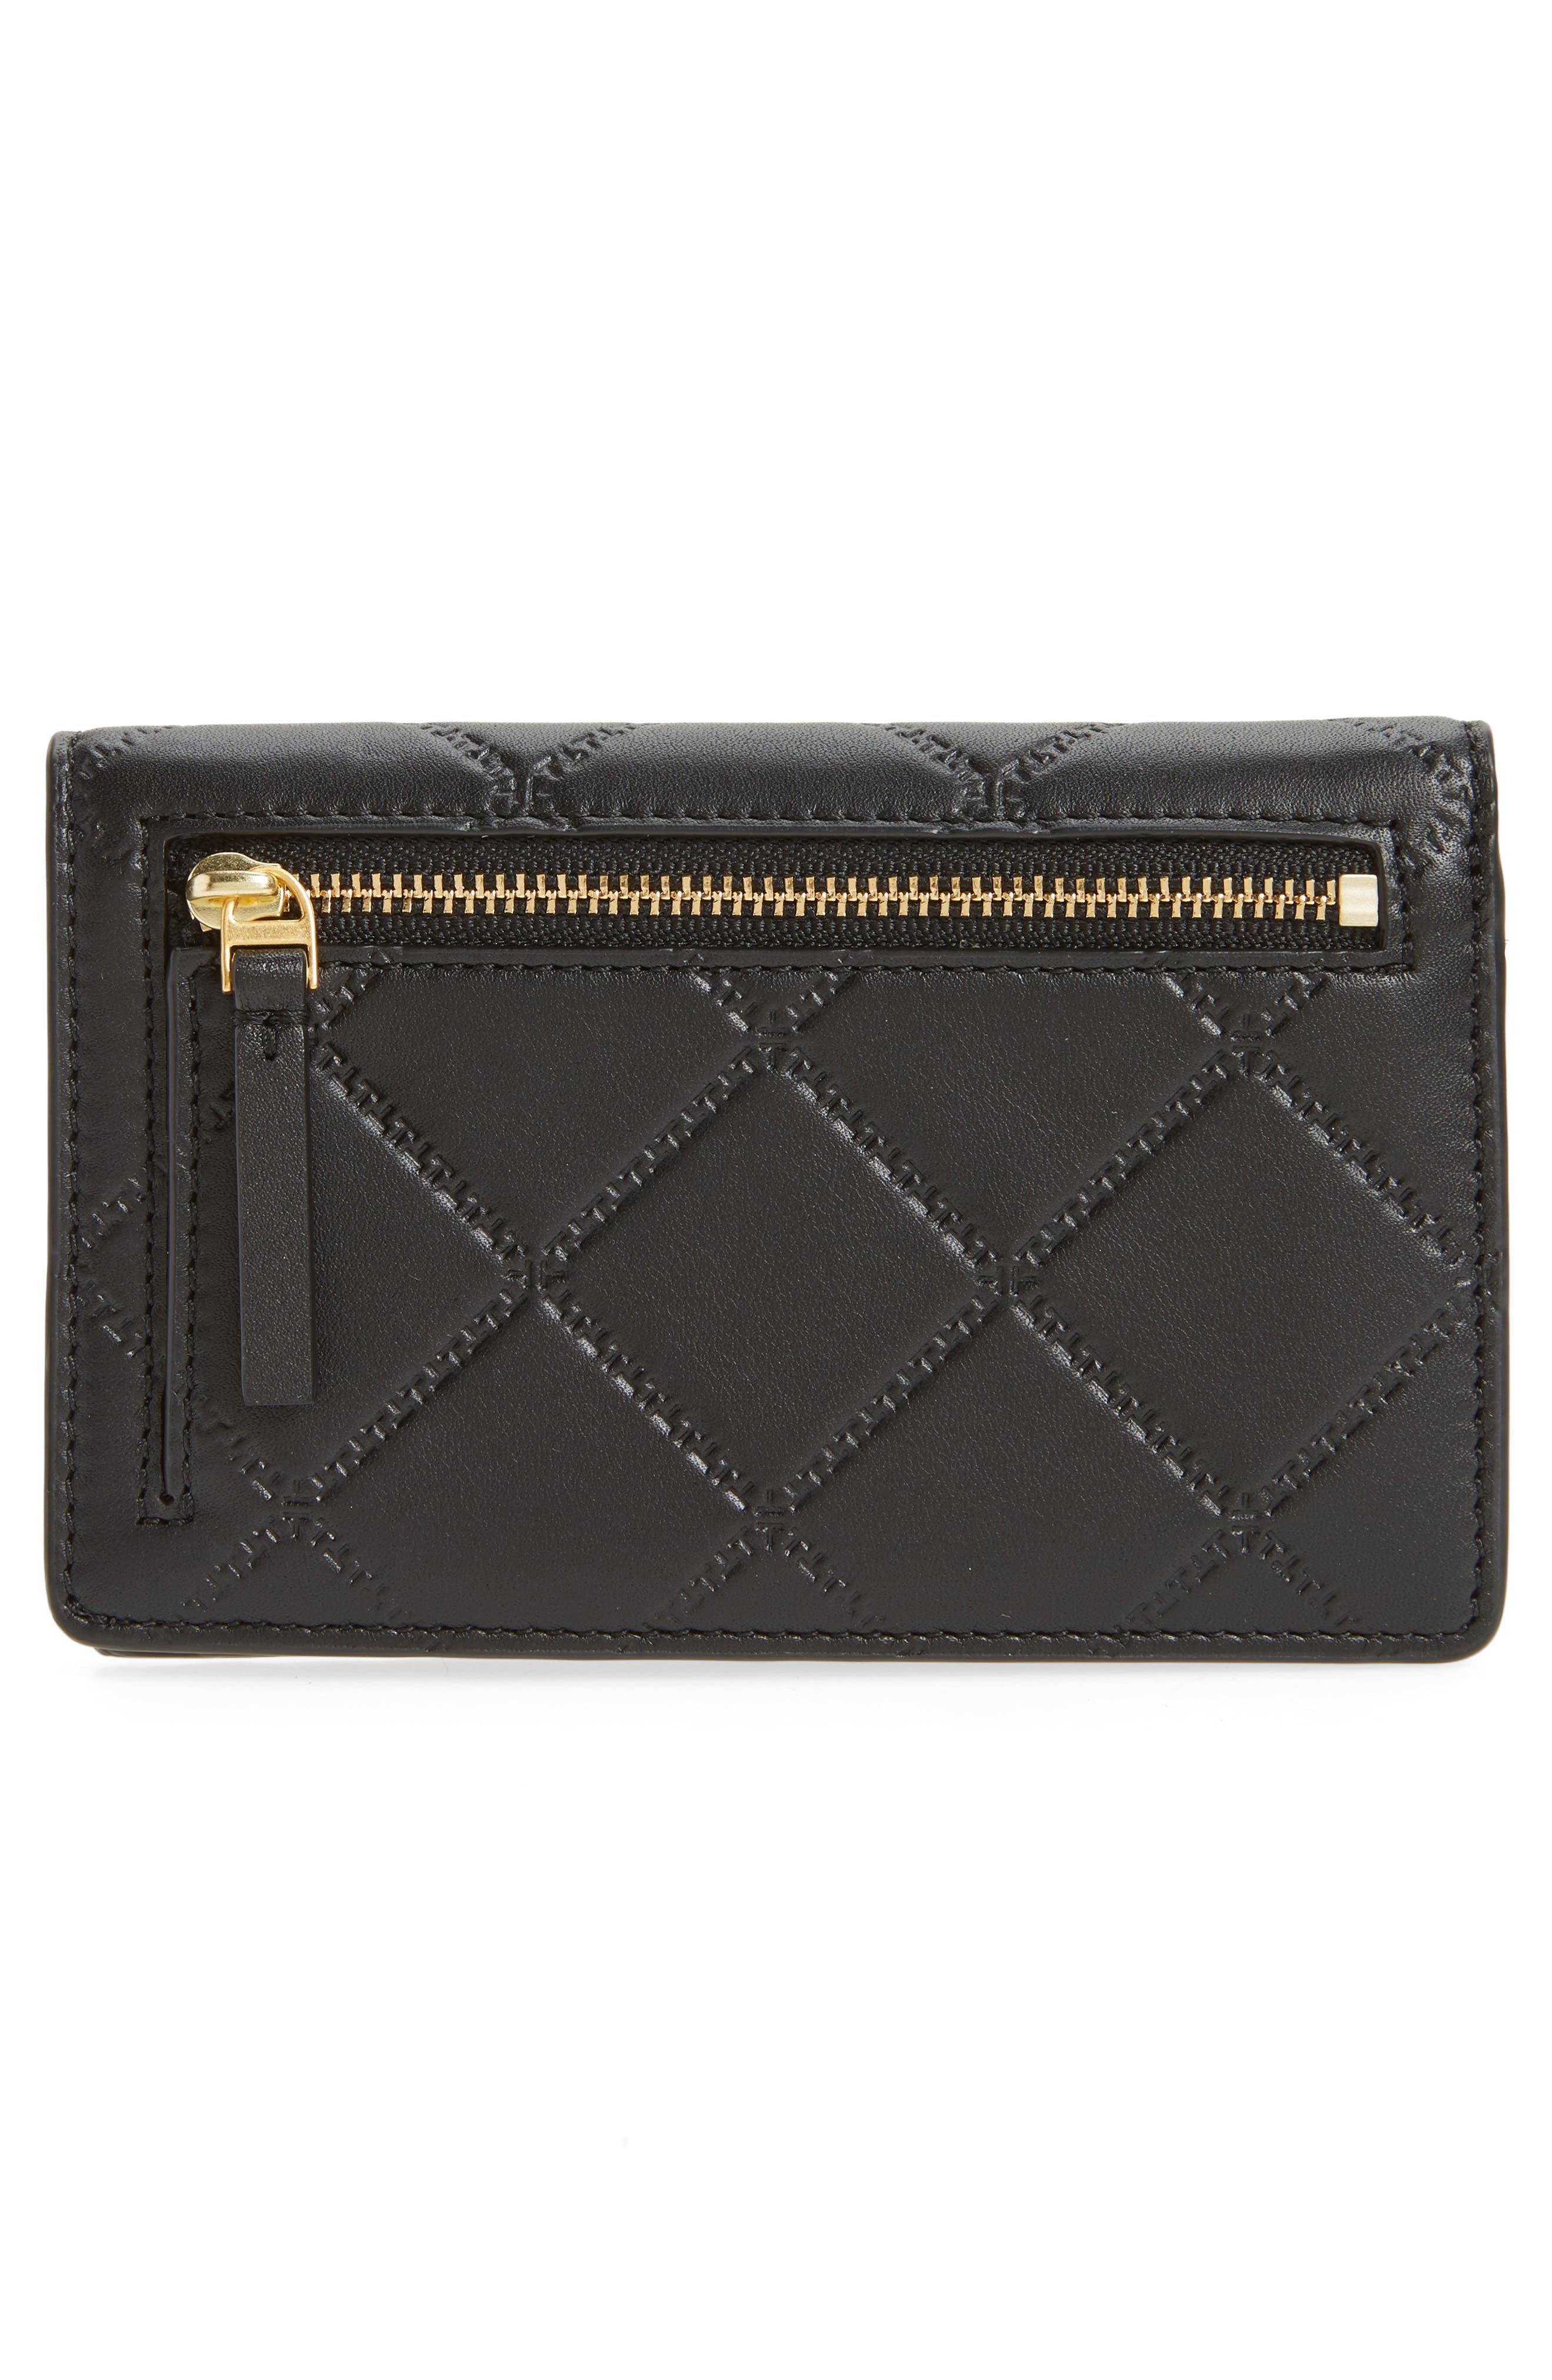 Medium Georgia Slim Leather Wallet,                             Alternate thumbnail 4, color,                             001